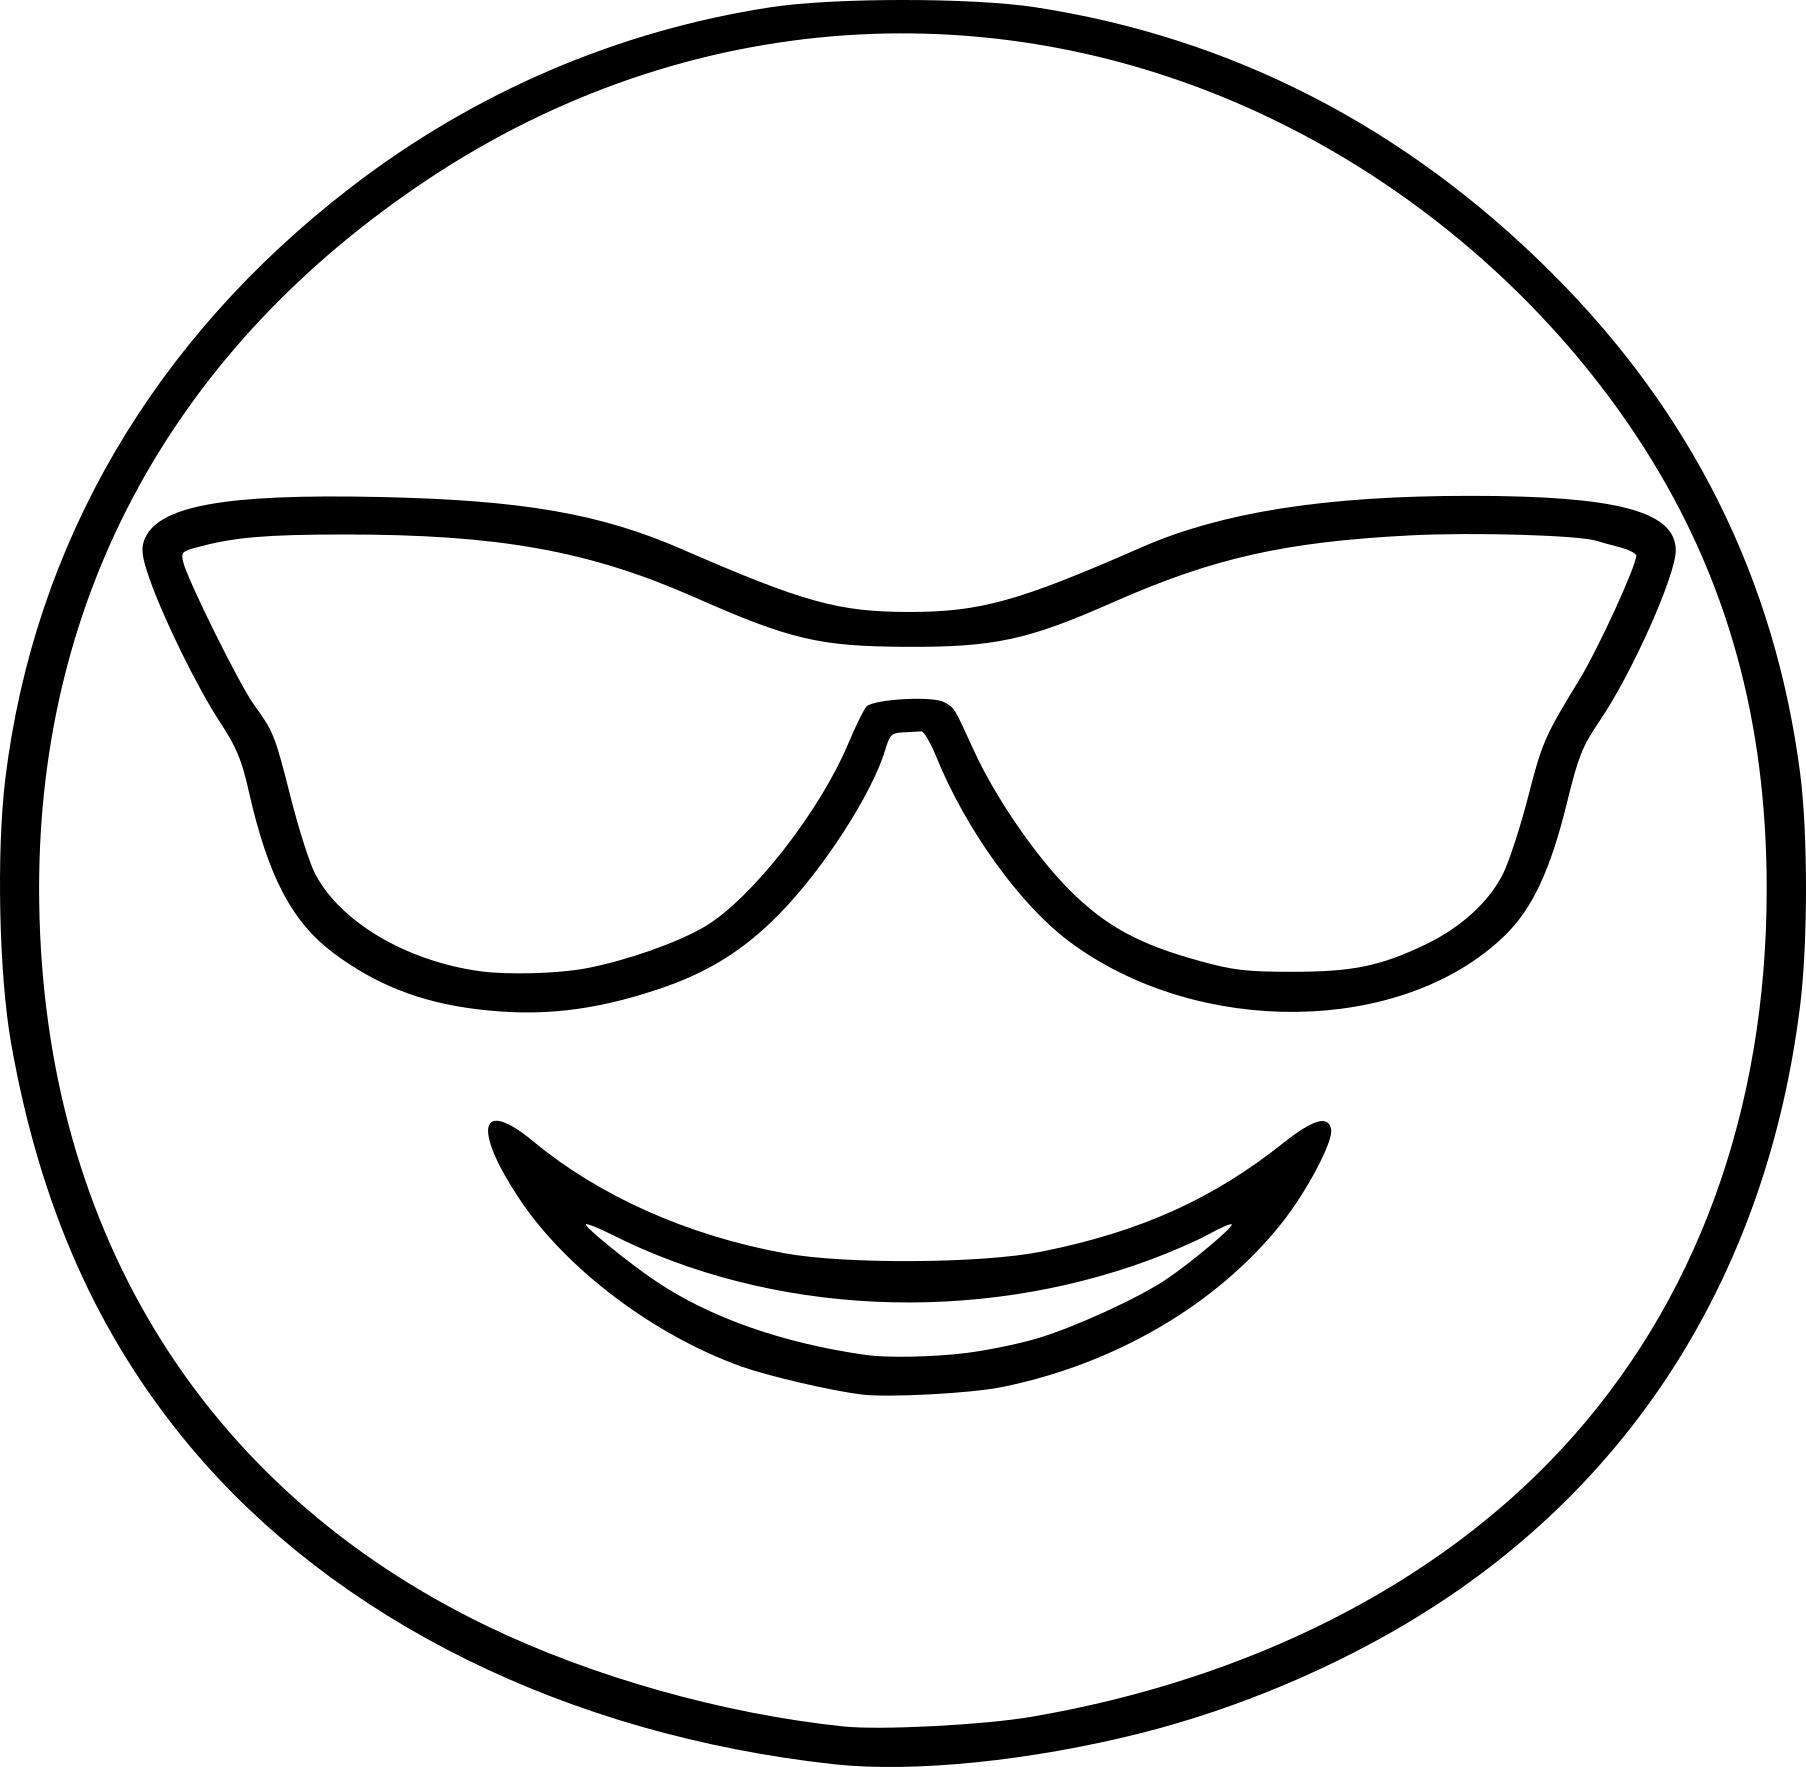 Coloriage Emoji Caca A Imprimer